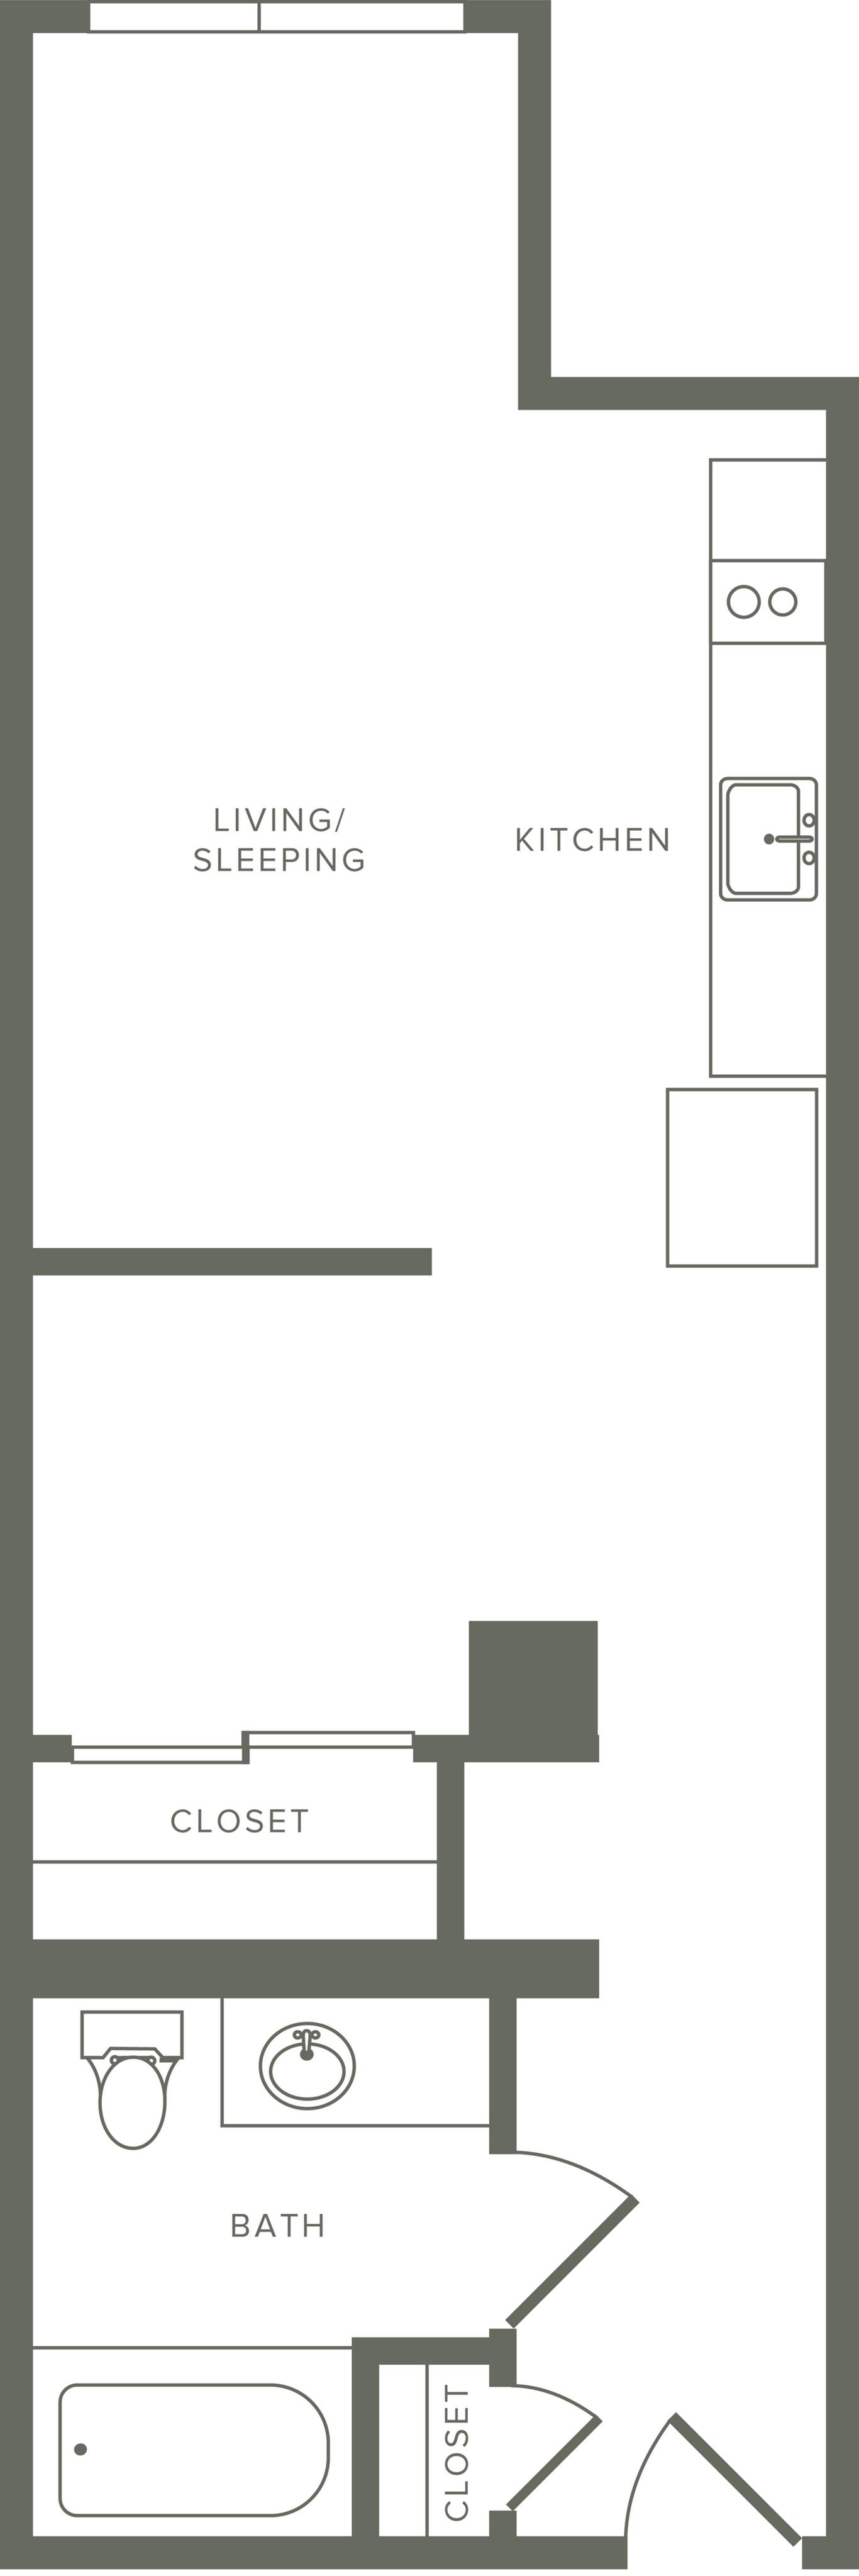 549 square foot studio one bath floor plan image